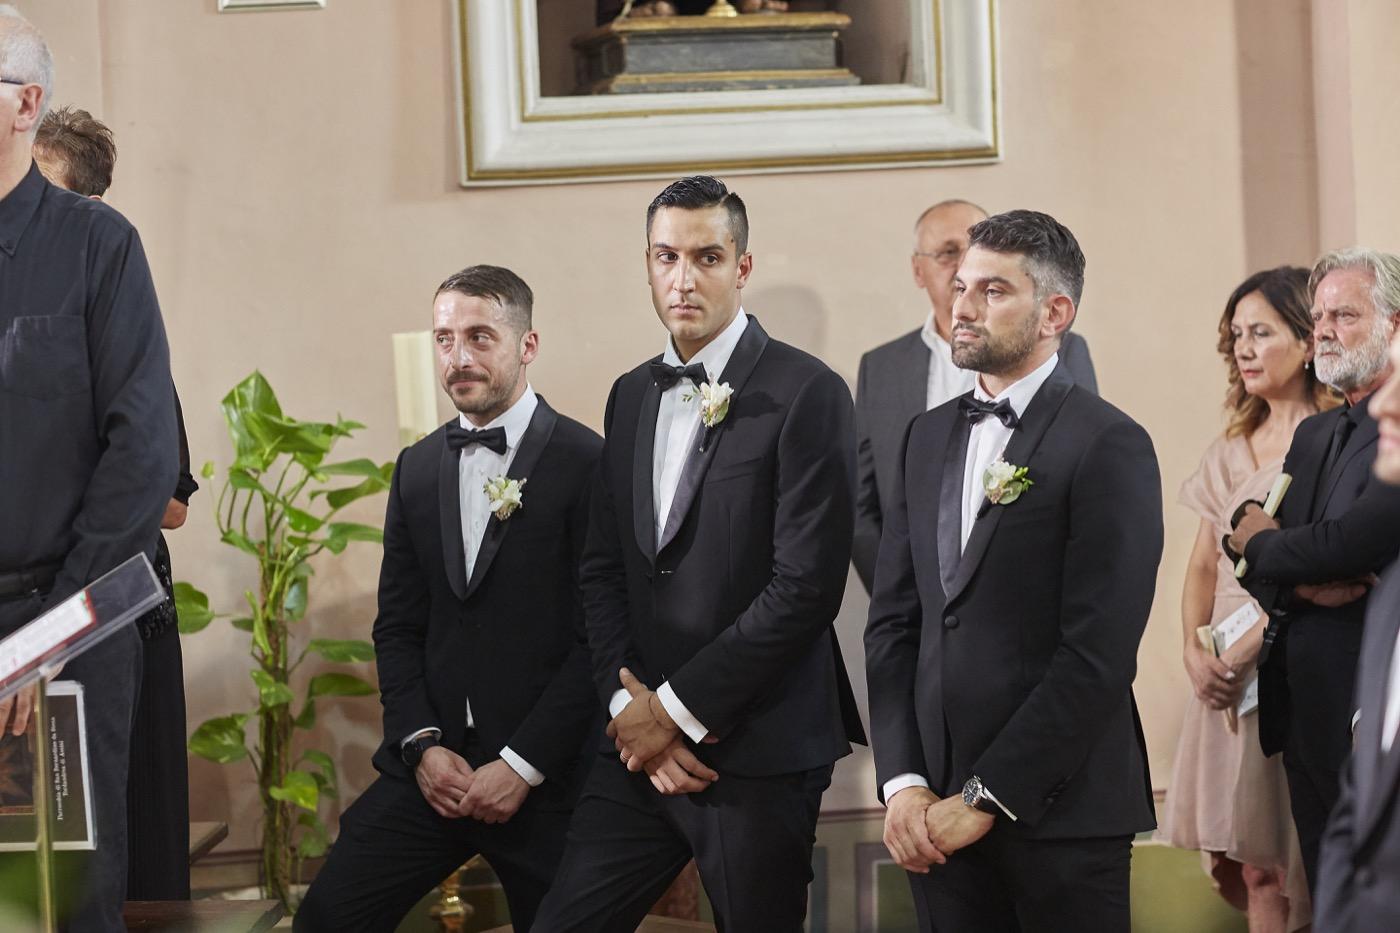 Claudio-Coppola-wedding-photographer-abbazia-7-frati-piegaro-45